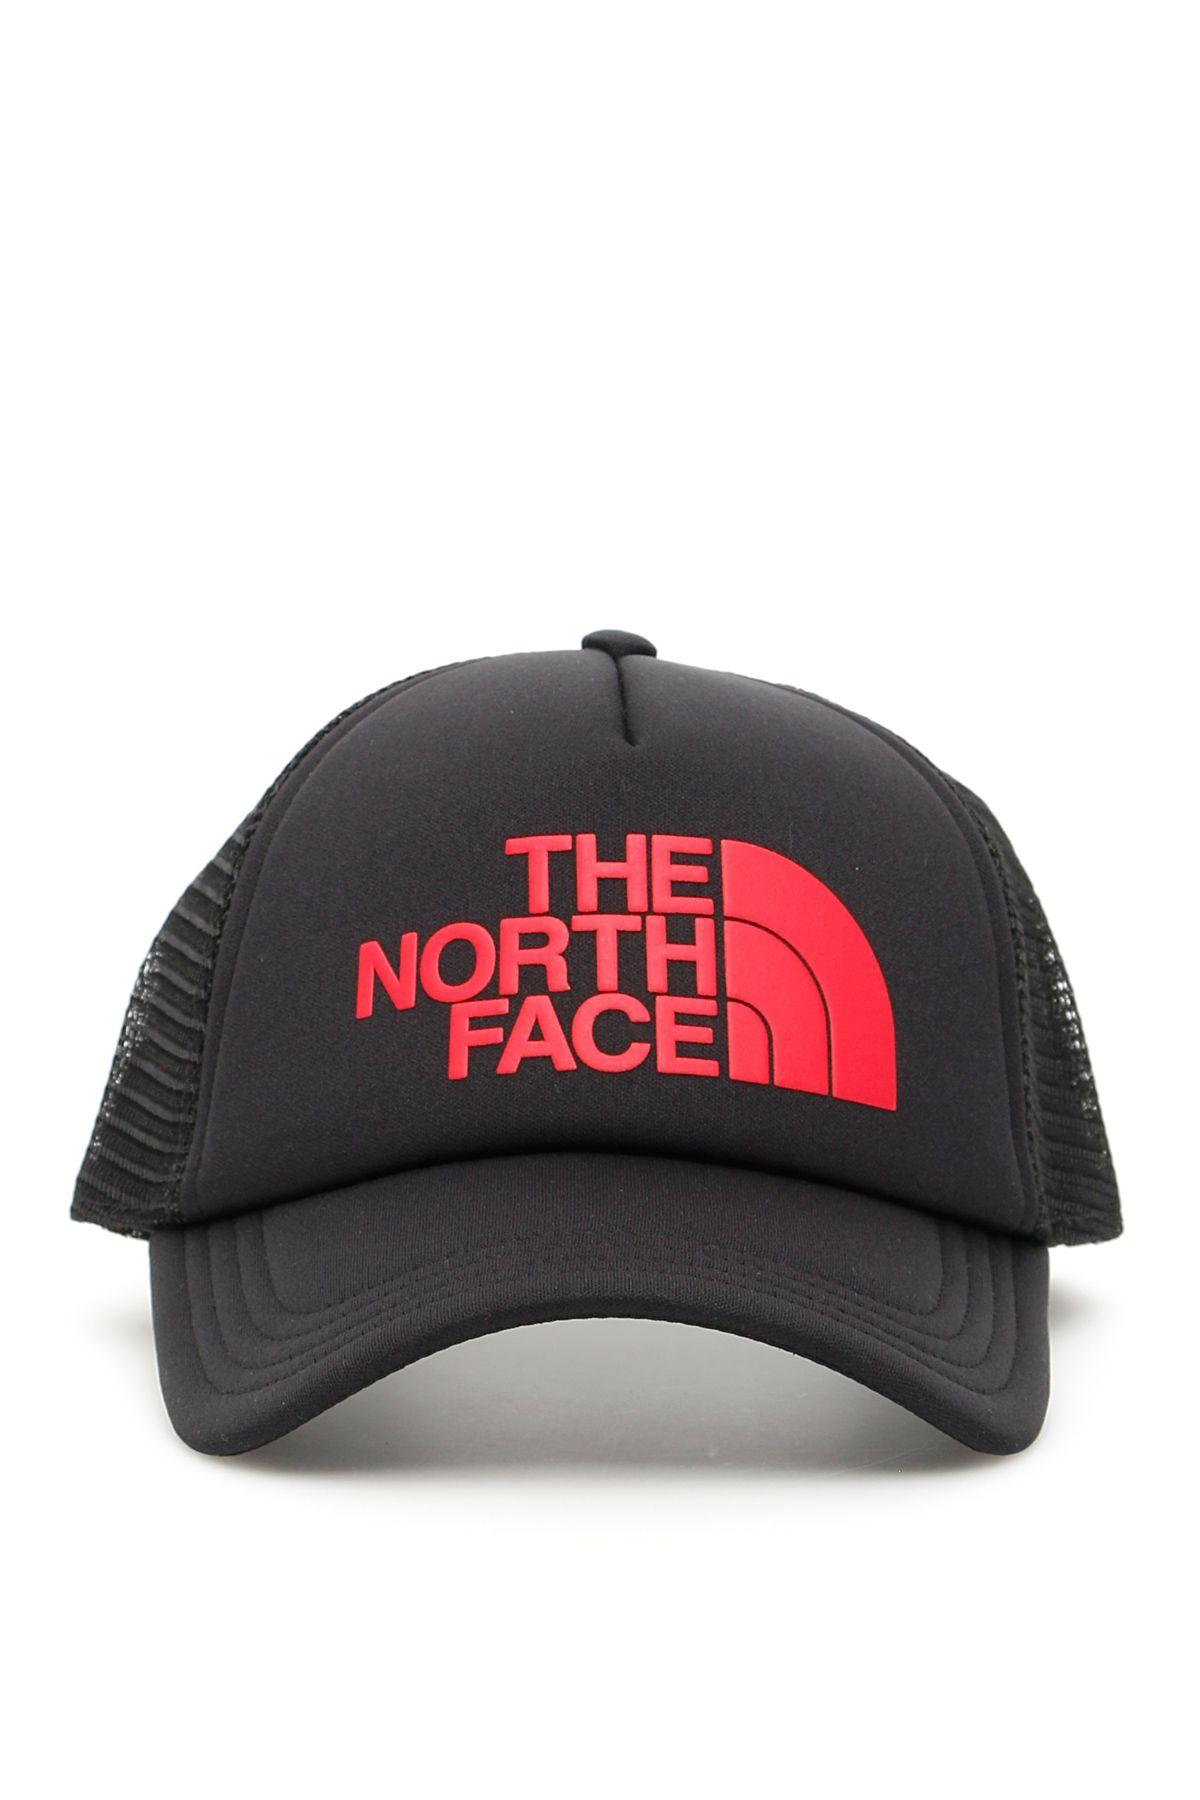 91f2cdb6030 The North Face The North Face Trucker Logo Cap - BLACK TNF